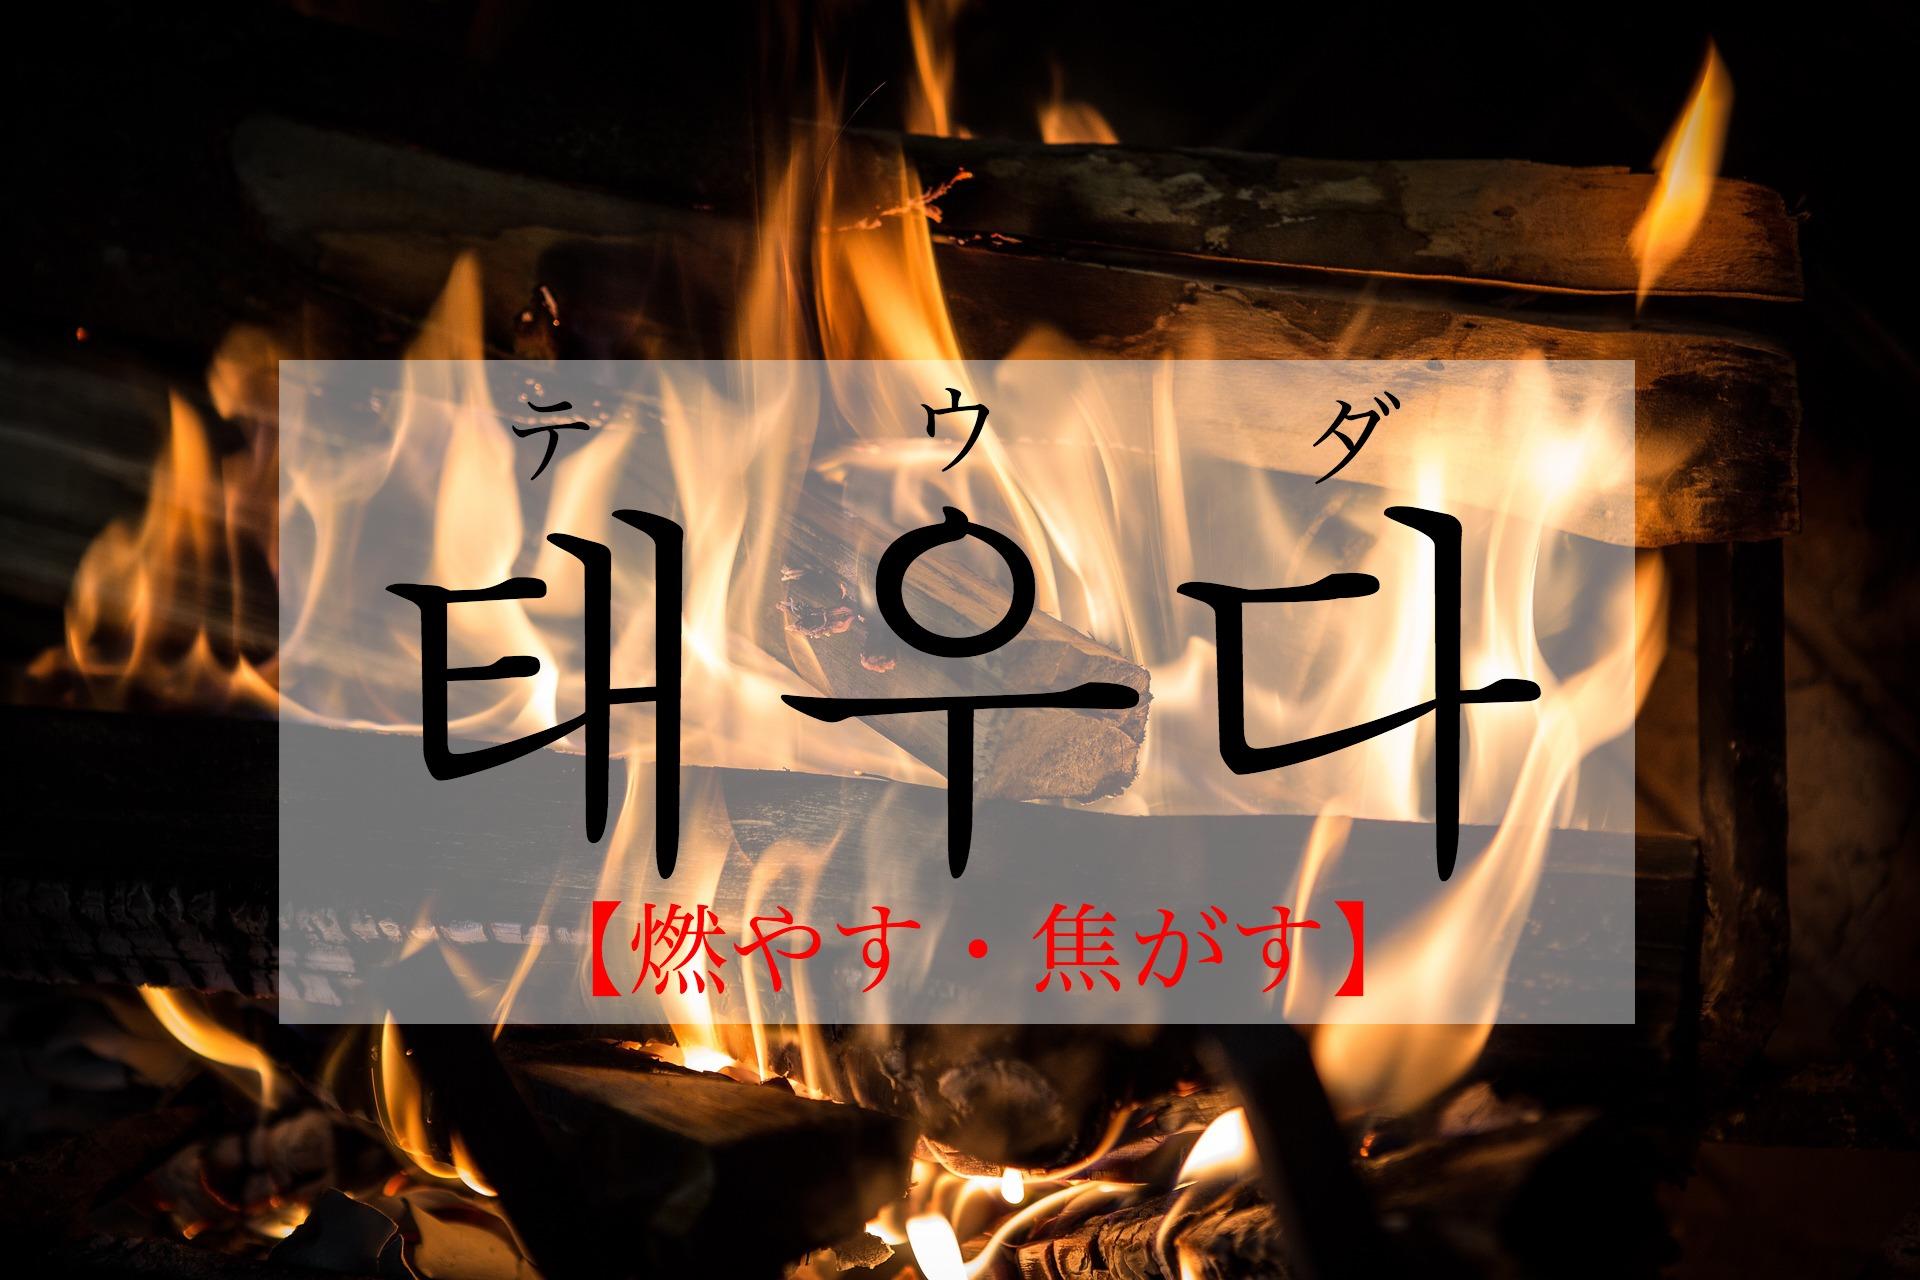 koreanword-burn